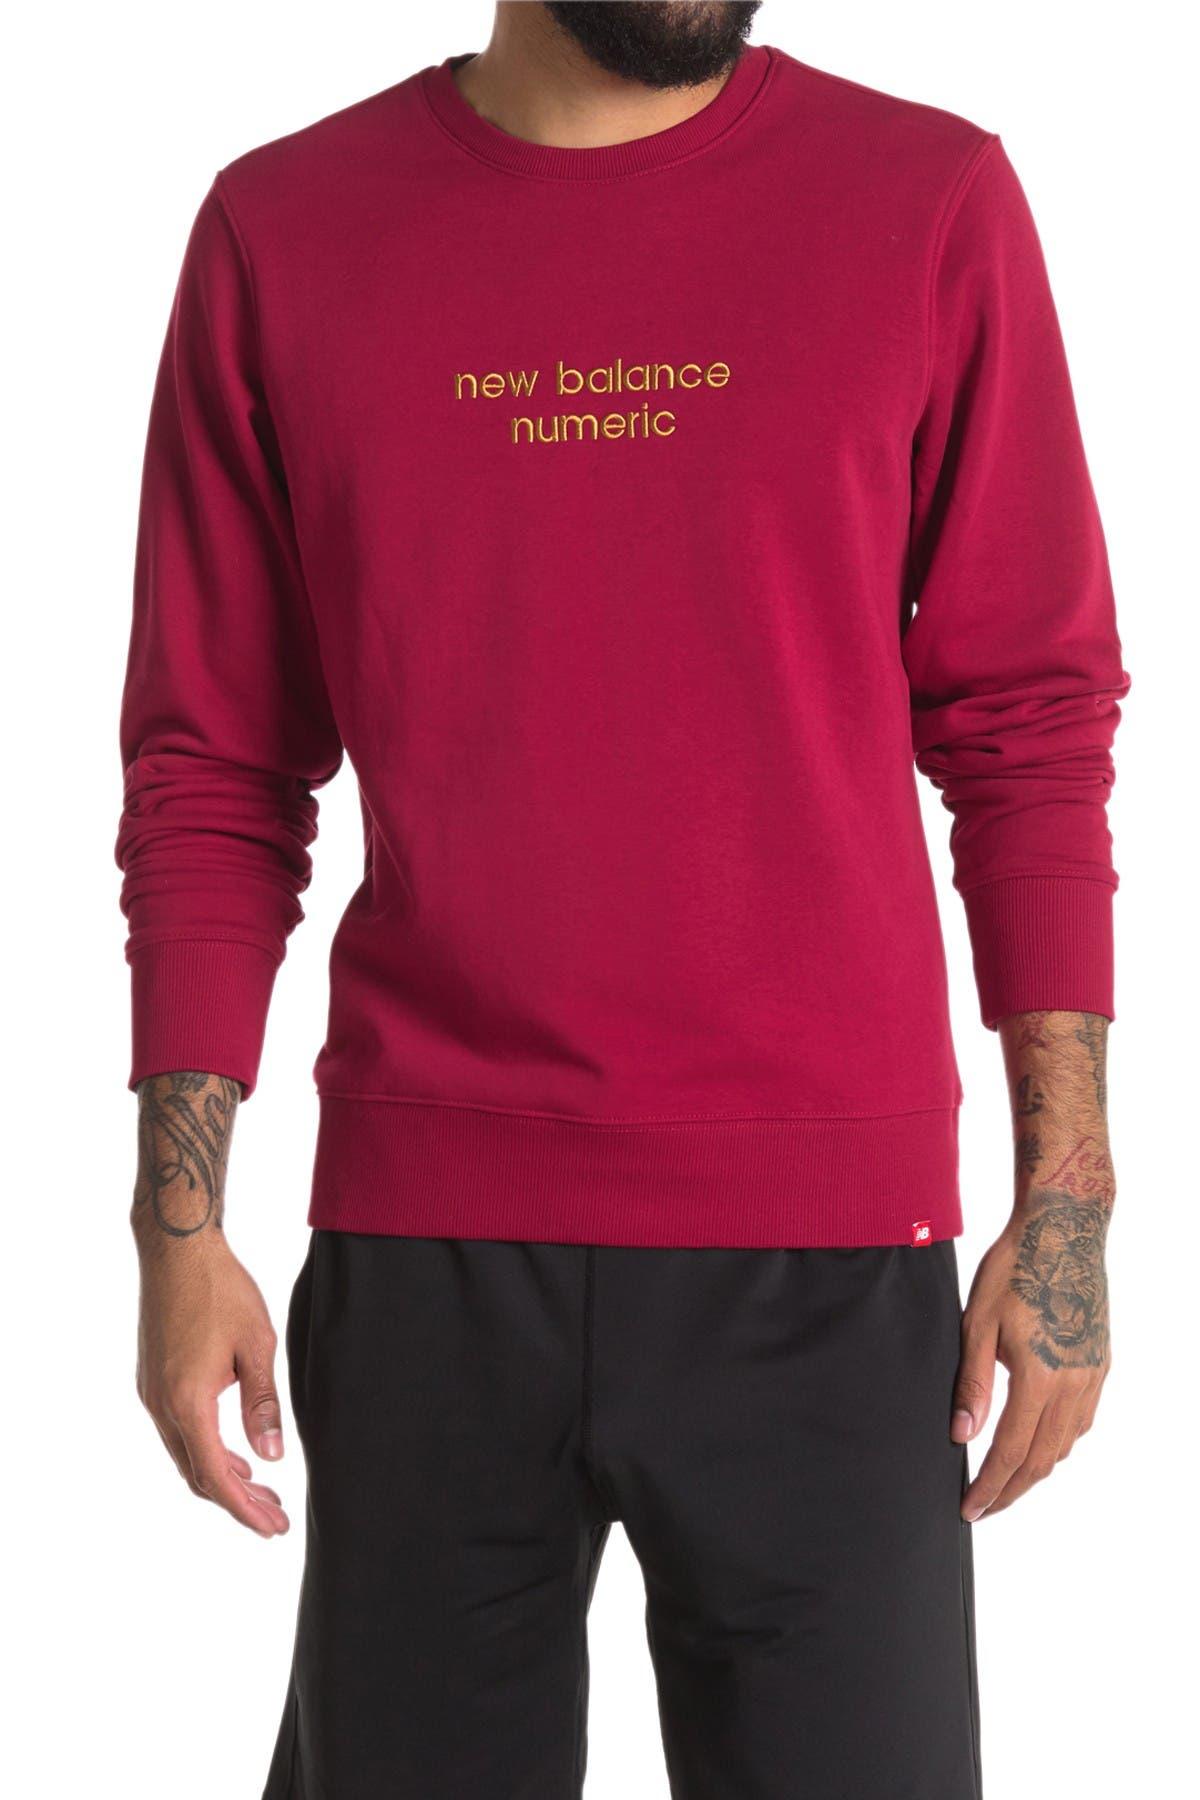 Image of New Balance Numeric Boutique T-Shirt